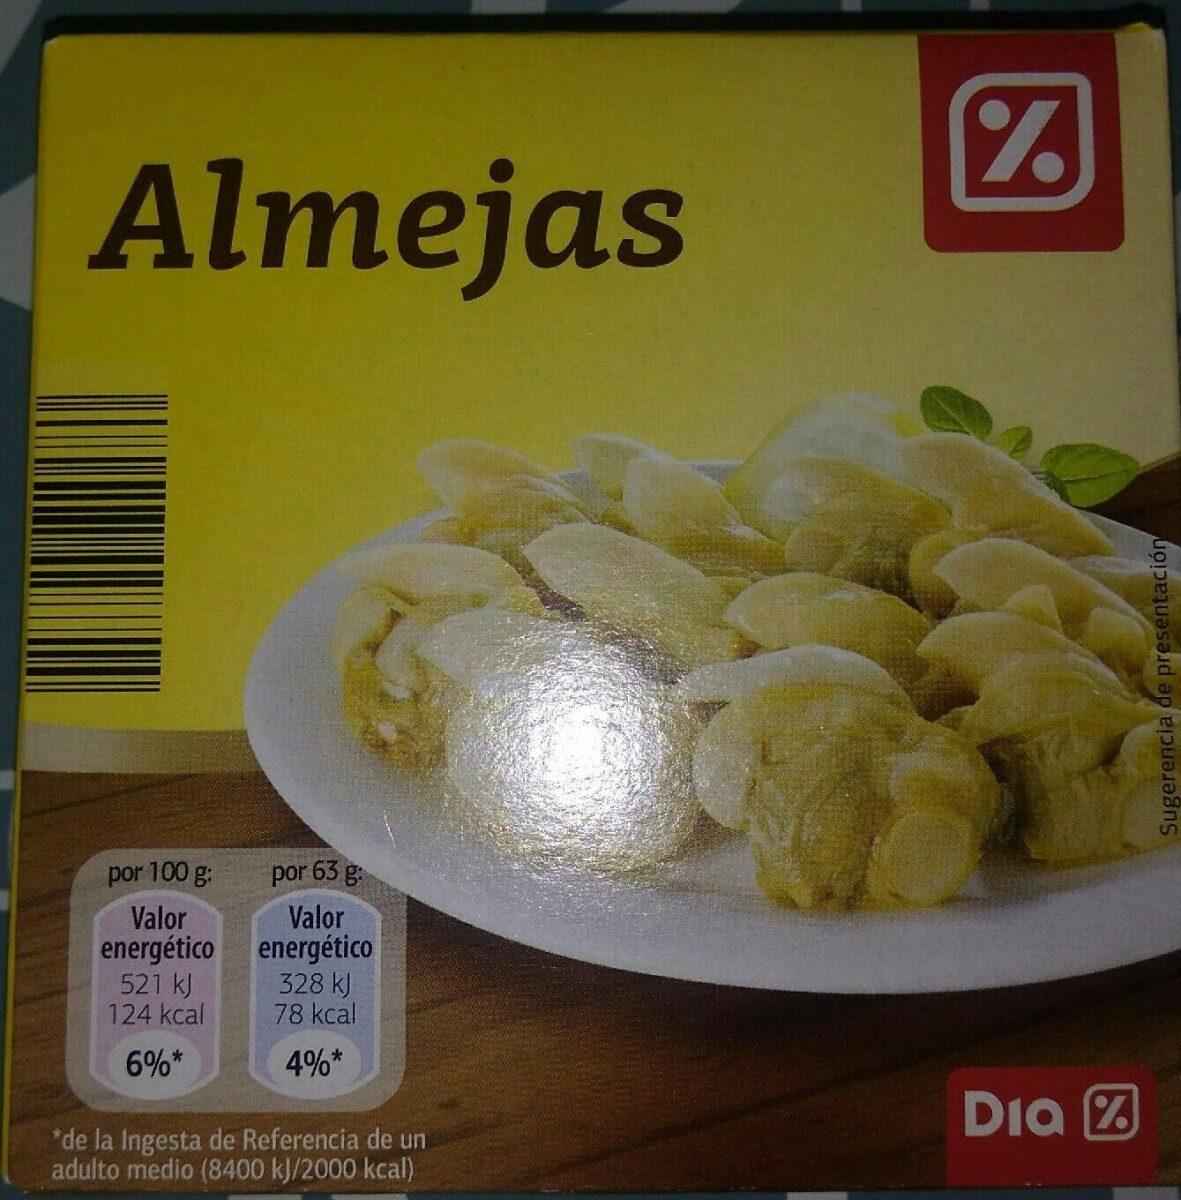 Almejas - Product